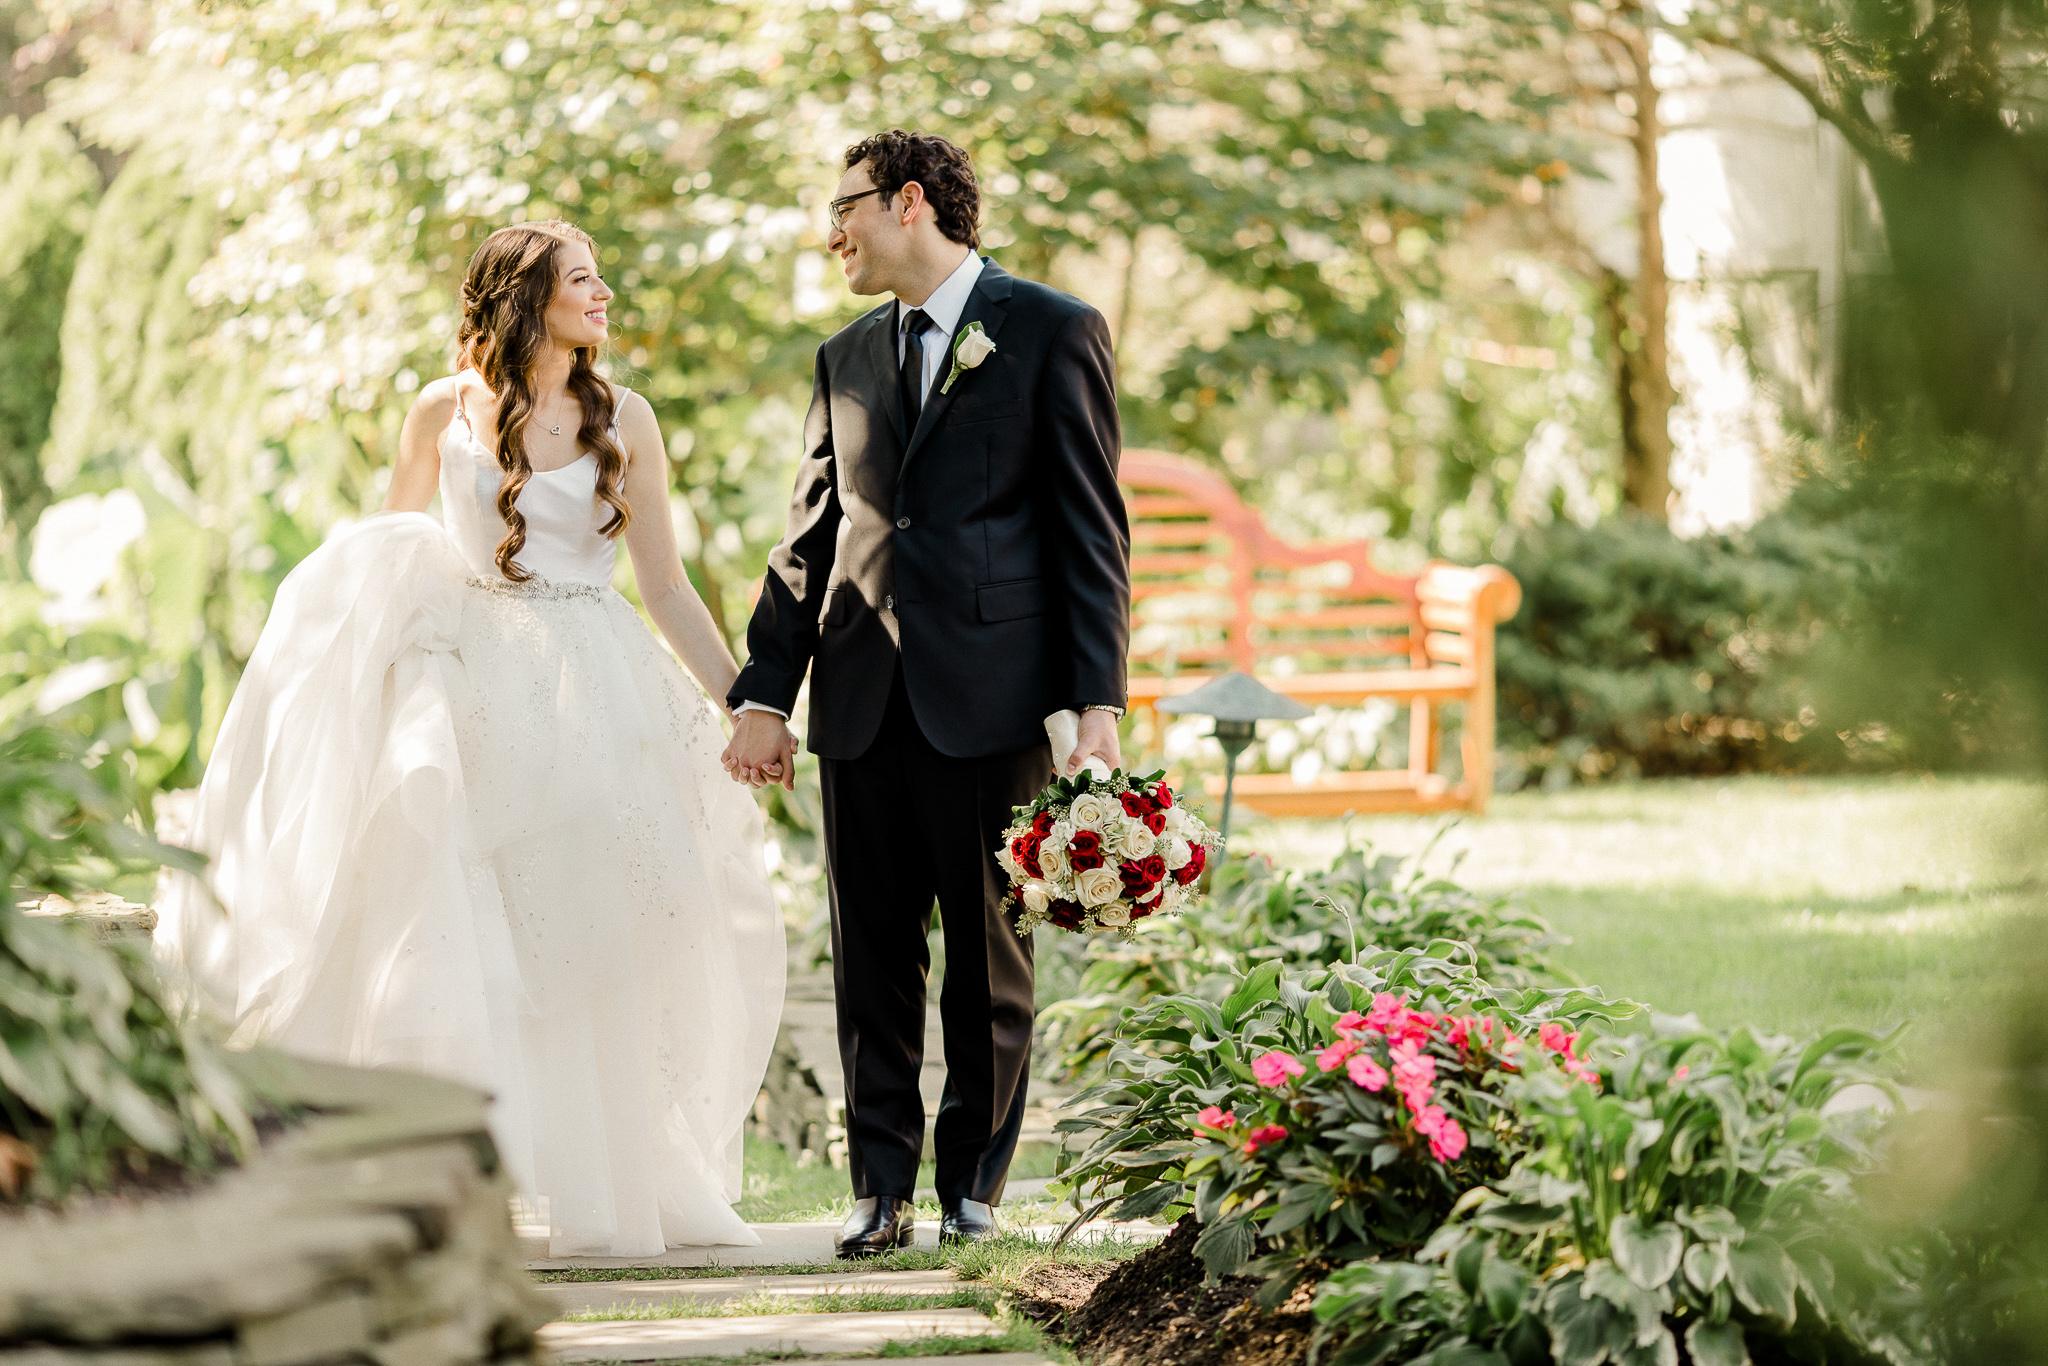 Happy bride and groom taking a walk | Lotus Wedding Photography